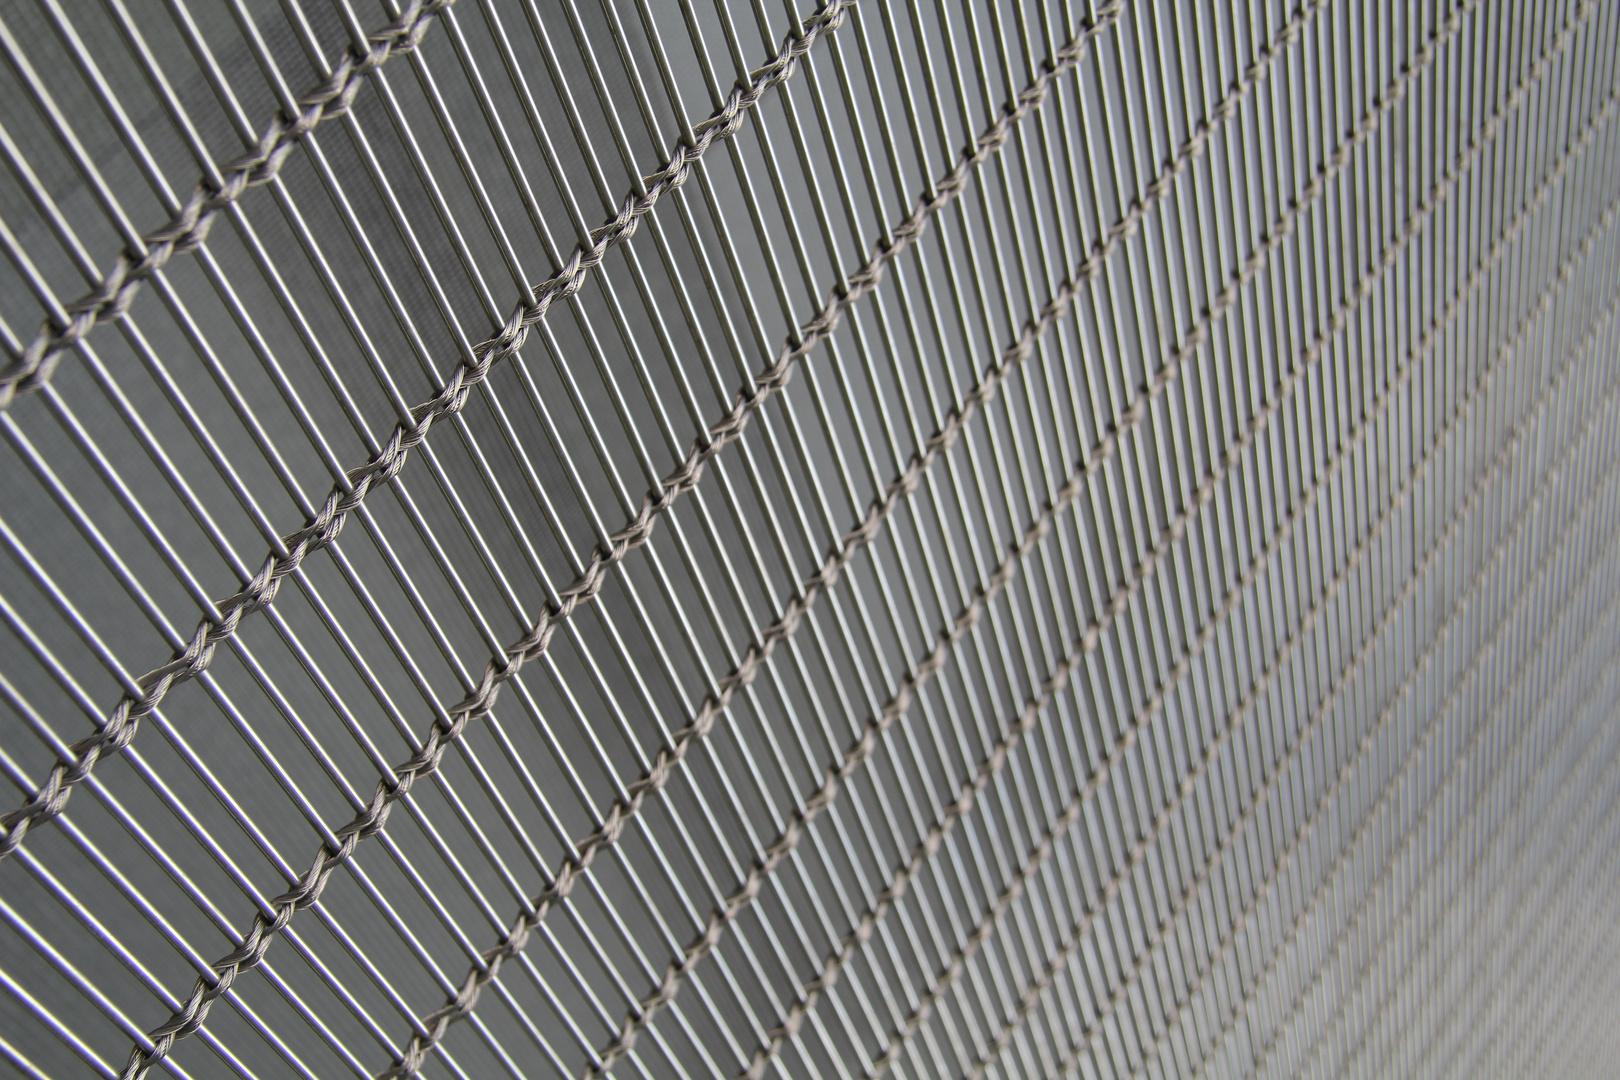 metall vorhang vom kunsthaus in mannheim foto bild konzept fotografie diagonalen spezial. Black Bedroom Furniture Sets. Home Design Ideas